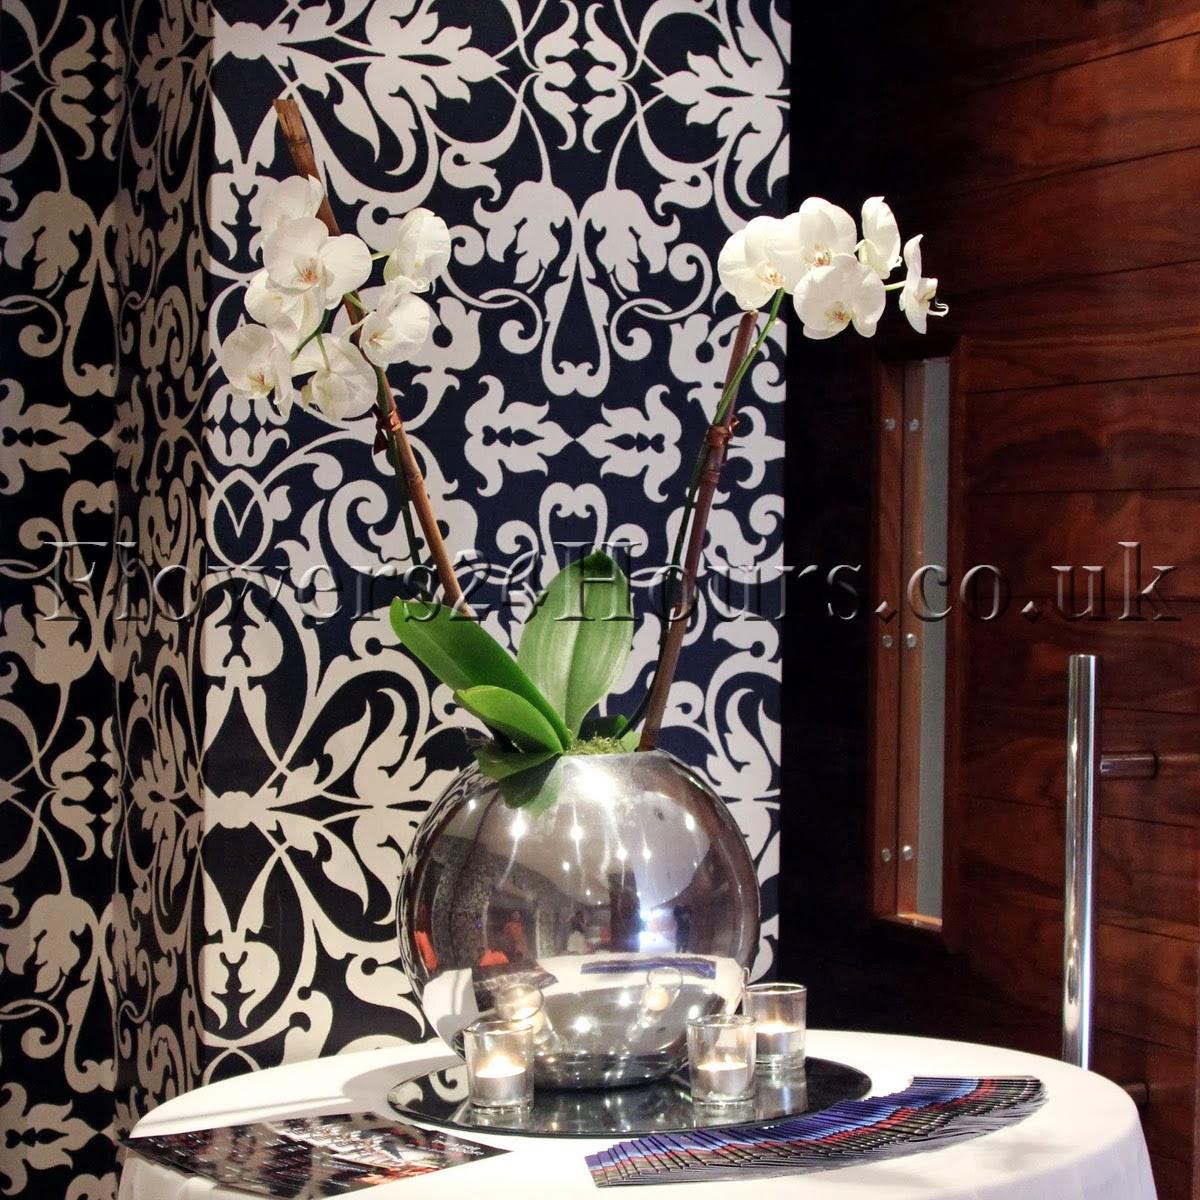 New Inspiring Selection of Flower Arrangements from UK Flower ... on florist books, florist bowls, florist centerpieces, florist containers, florist tools,